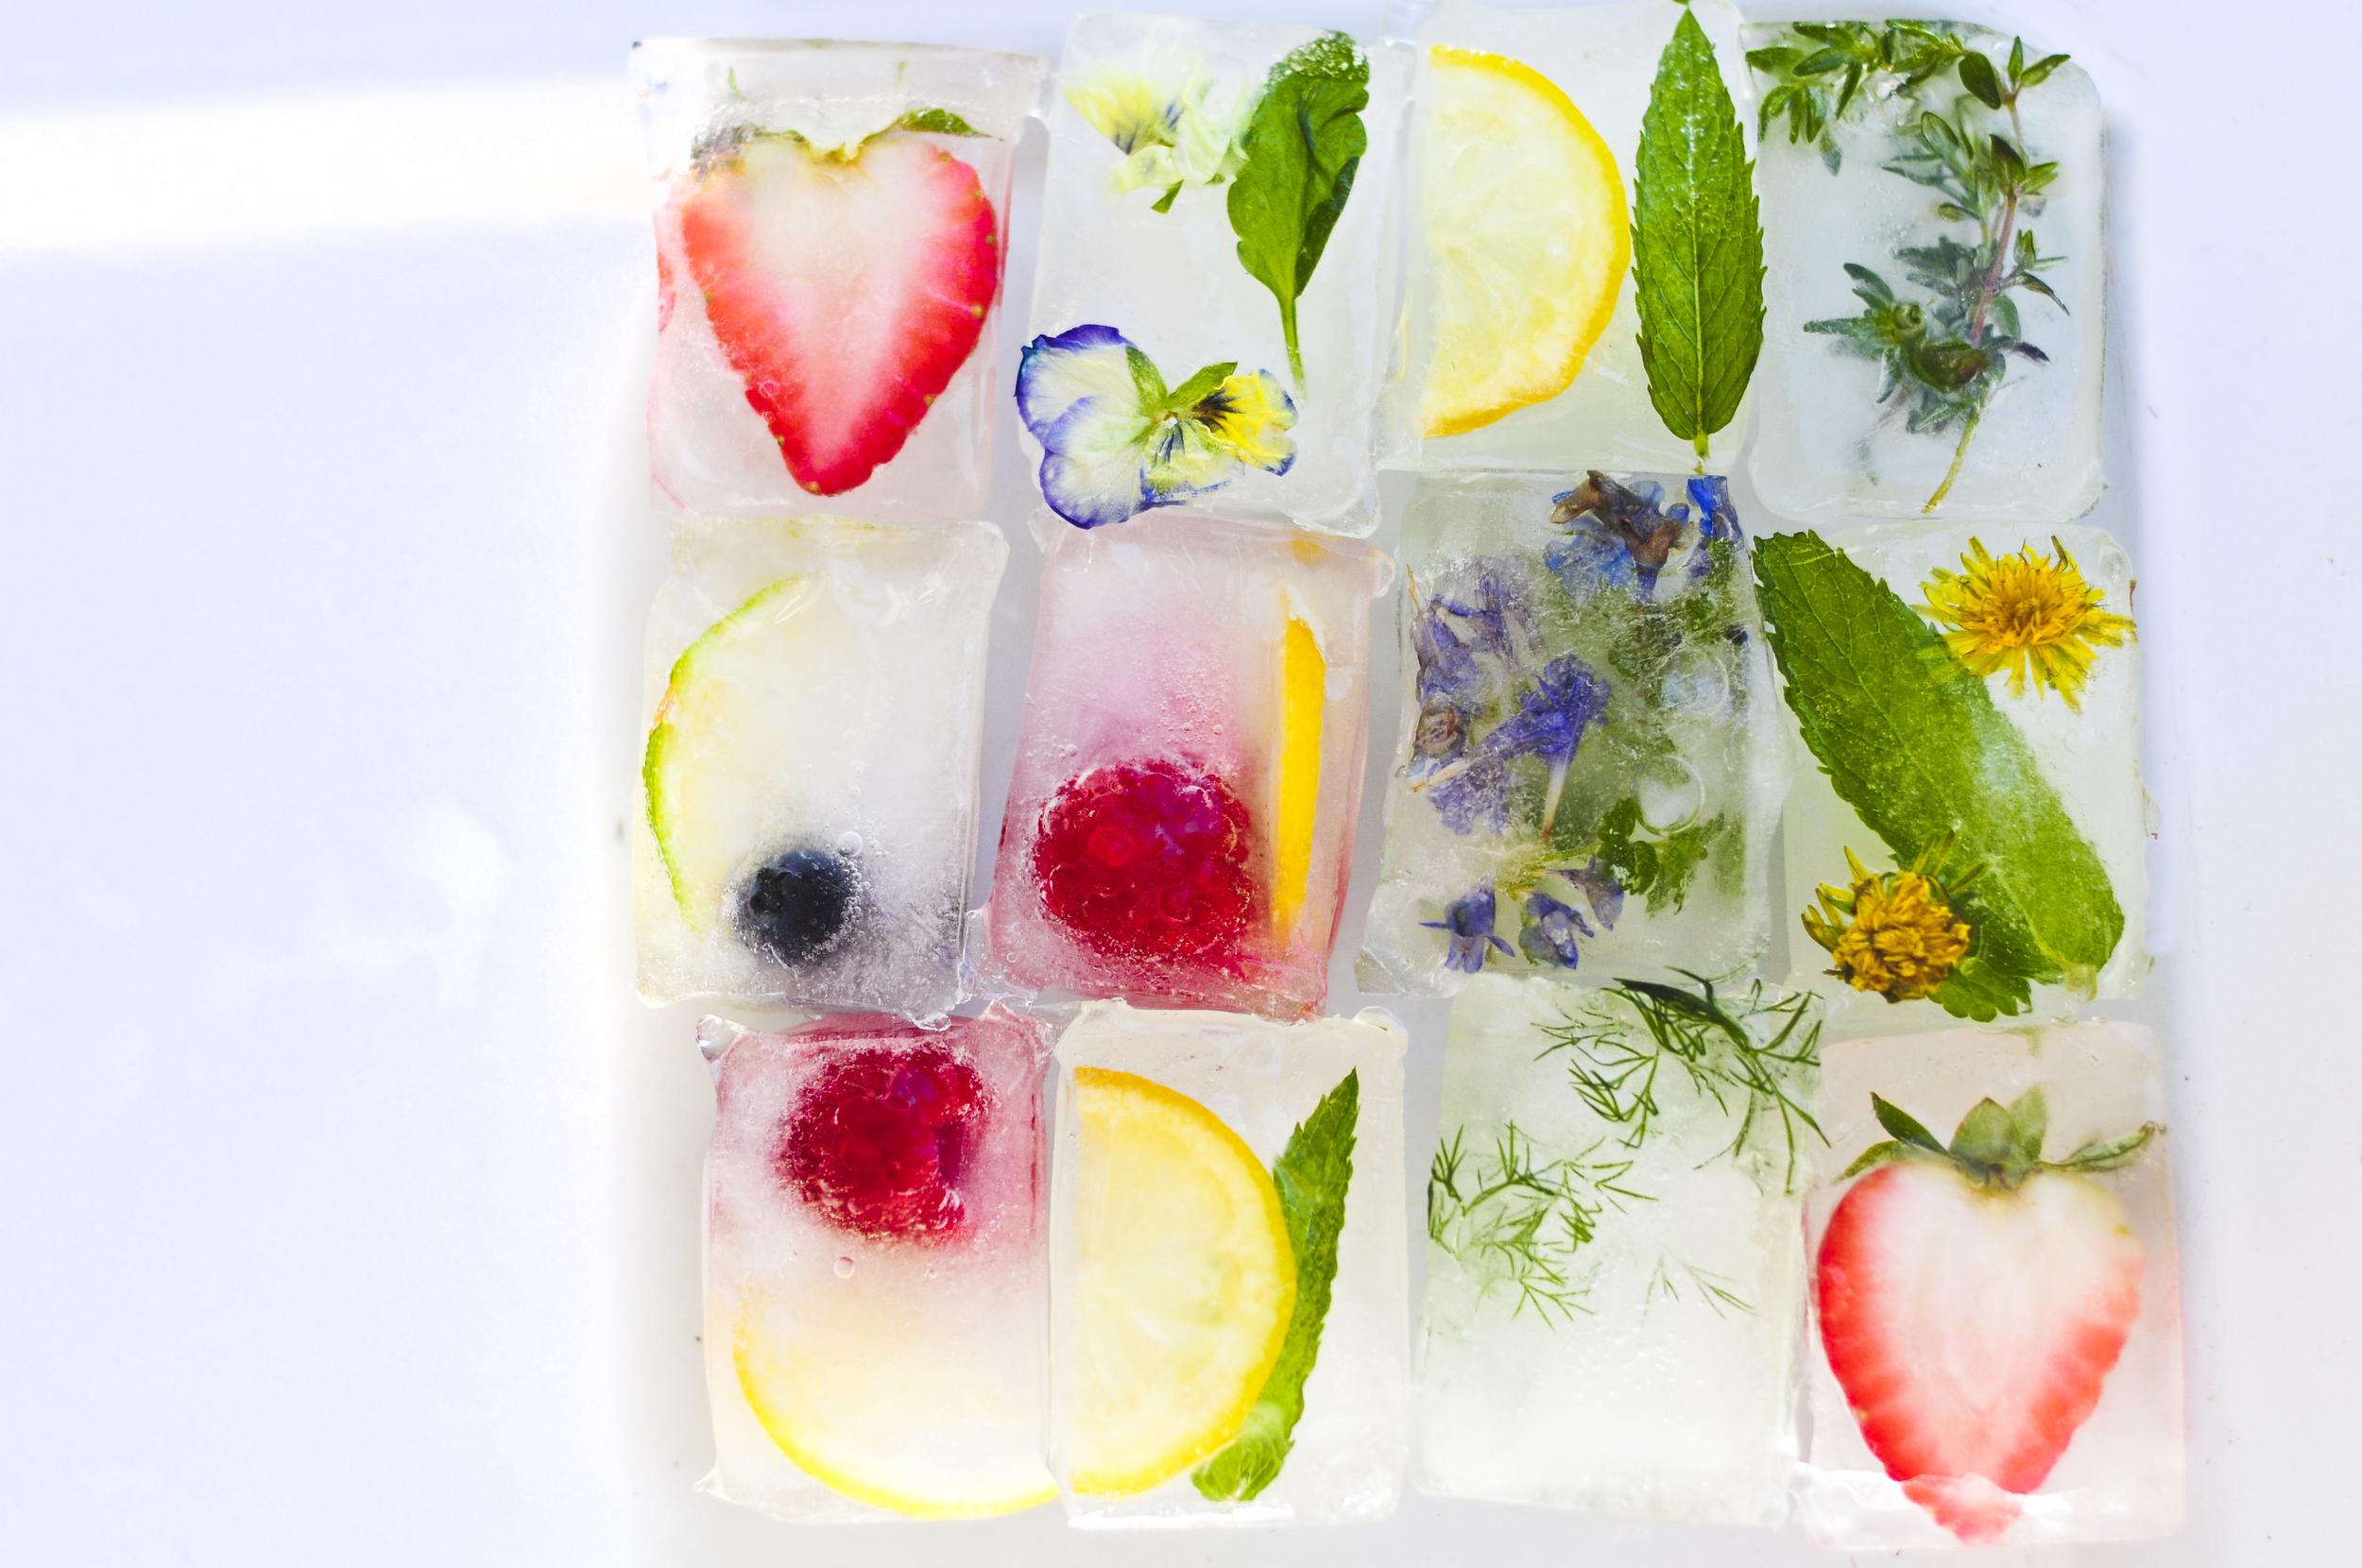 a.big.ice.cubes.drink.herb.berry.herb.lemon.berry.detox.forest.food.DSC_9132.jpg